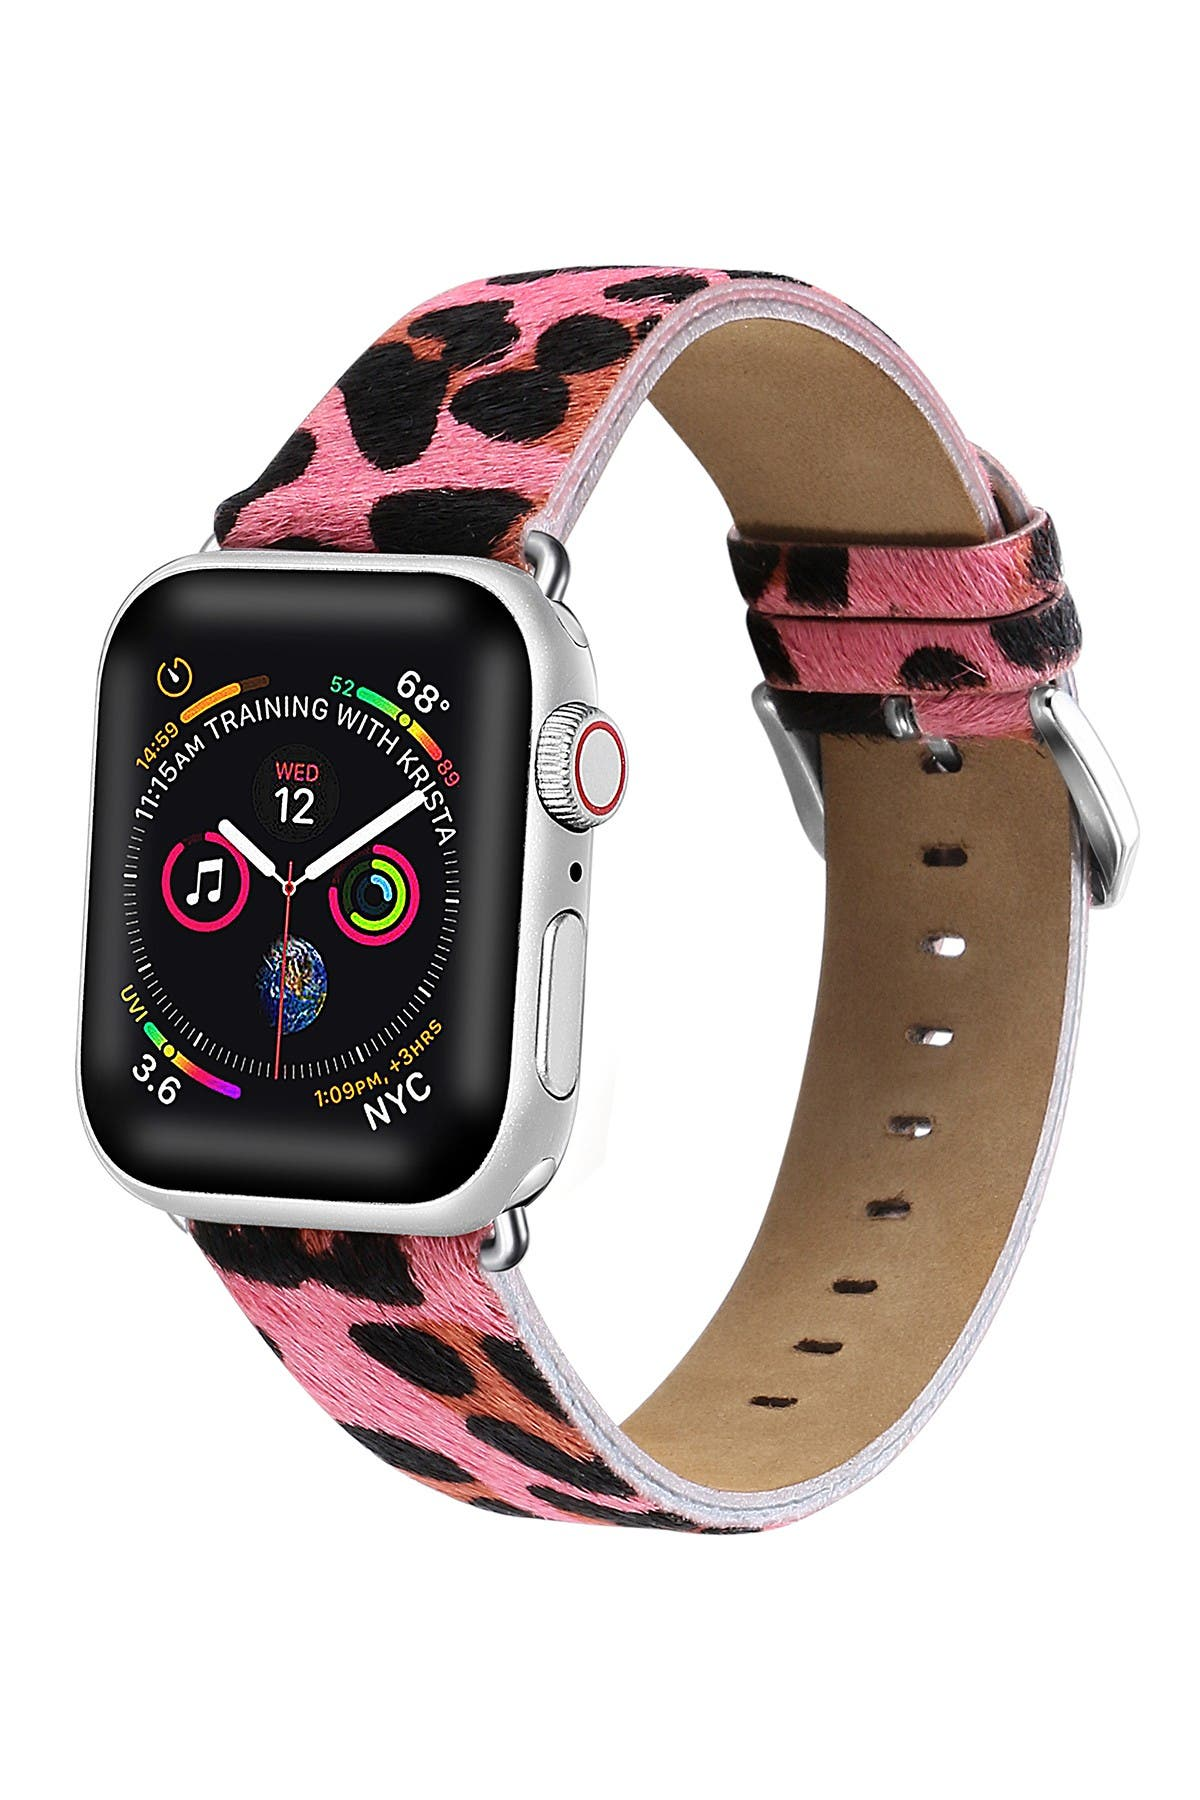 Image of POSH TECH Pink Cheetah Calf Hair 38mm Apple Watch 1, 2, 3, 4 Band